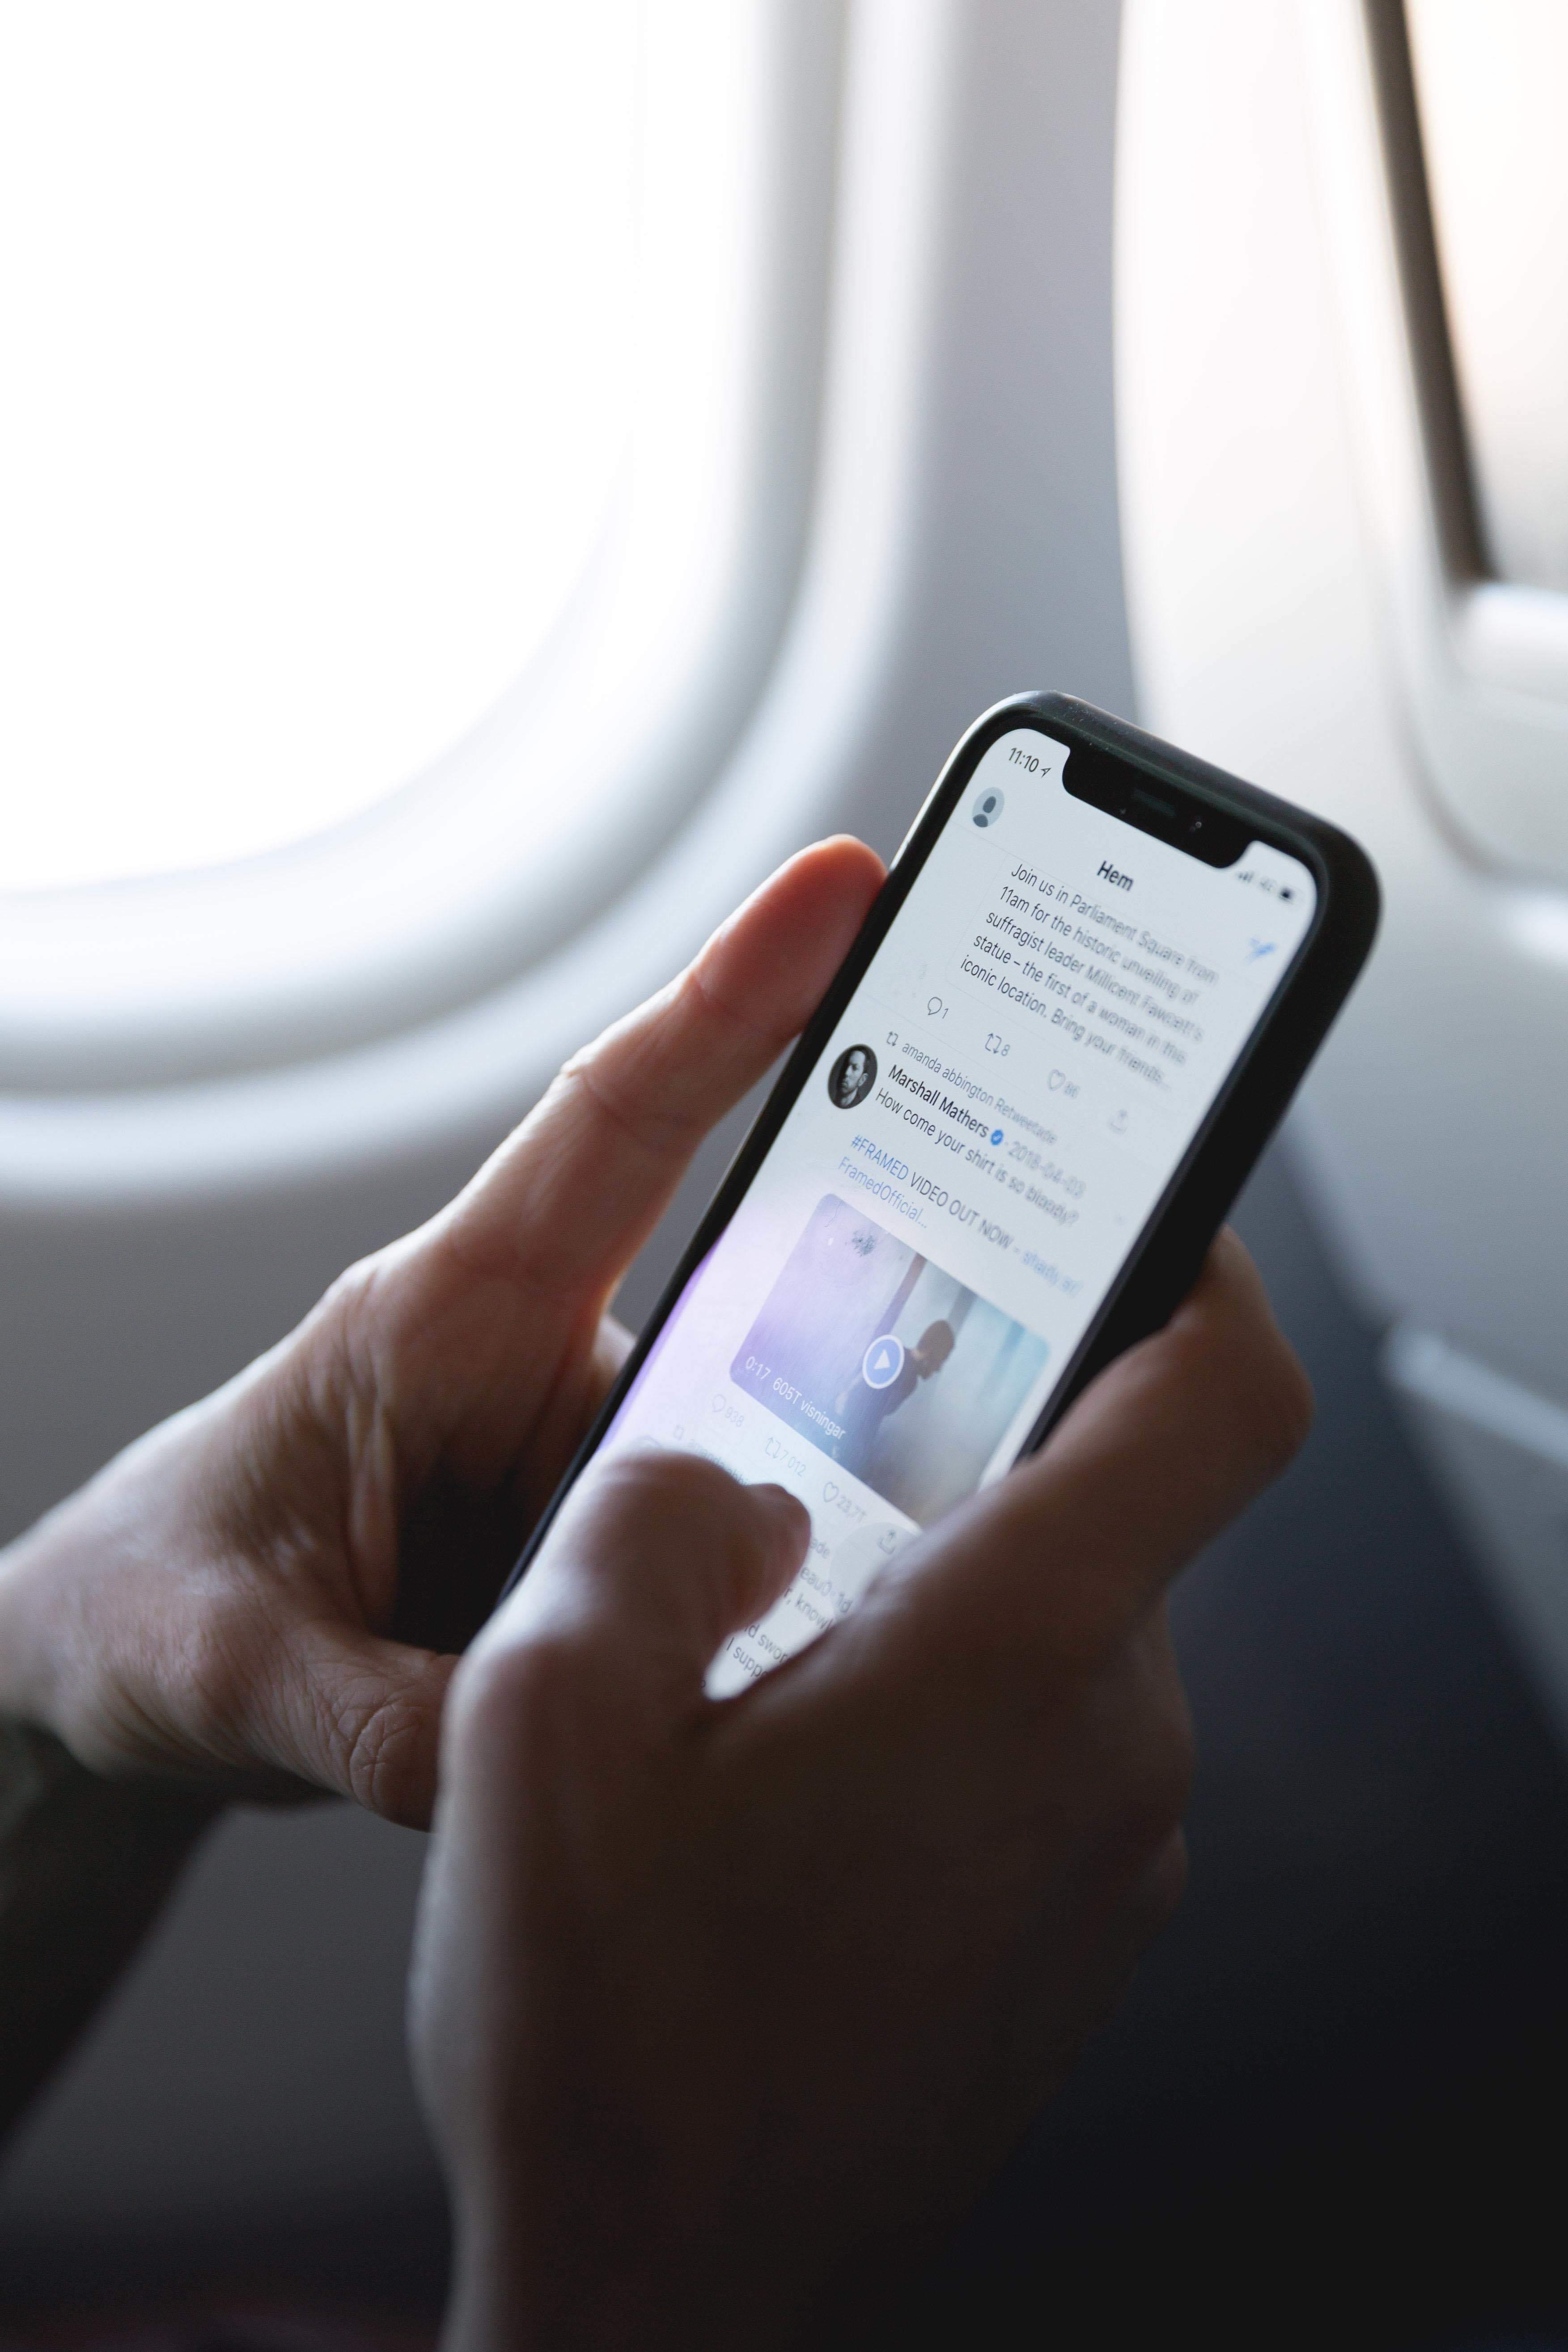 man checks Twitter on plane